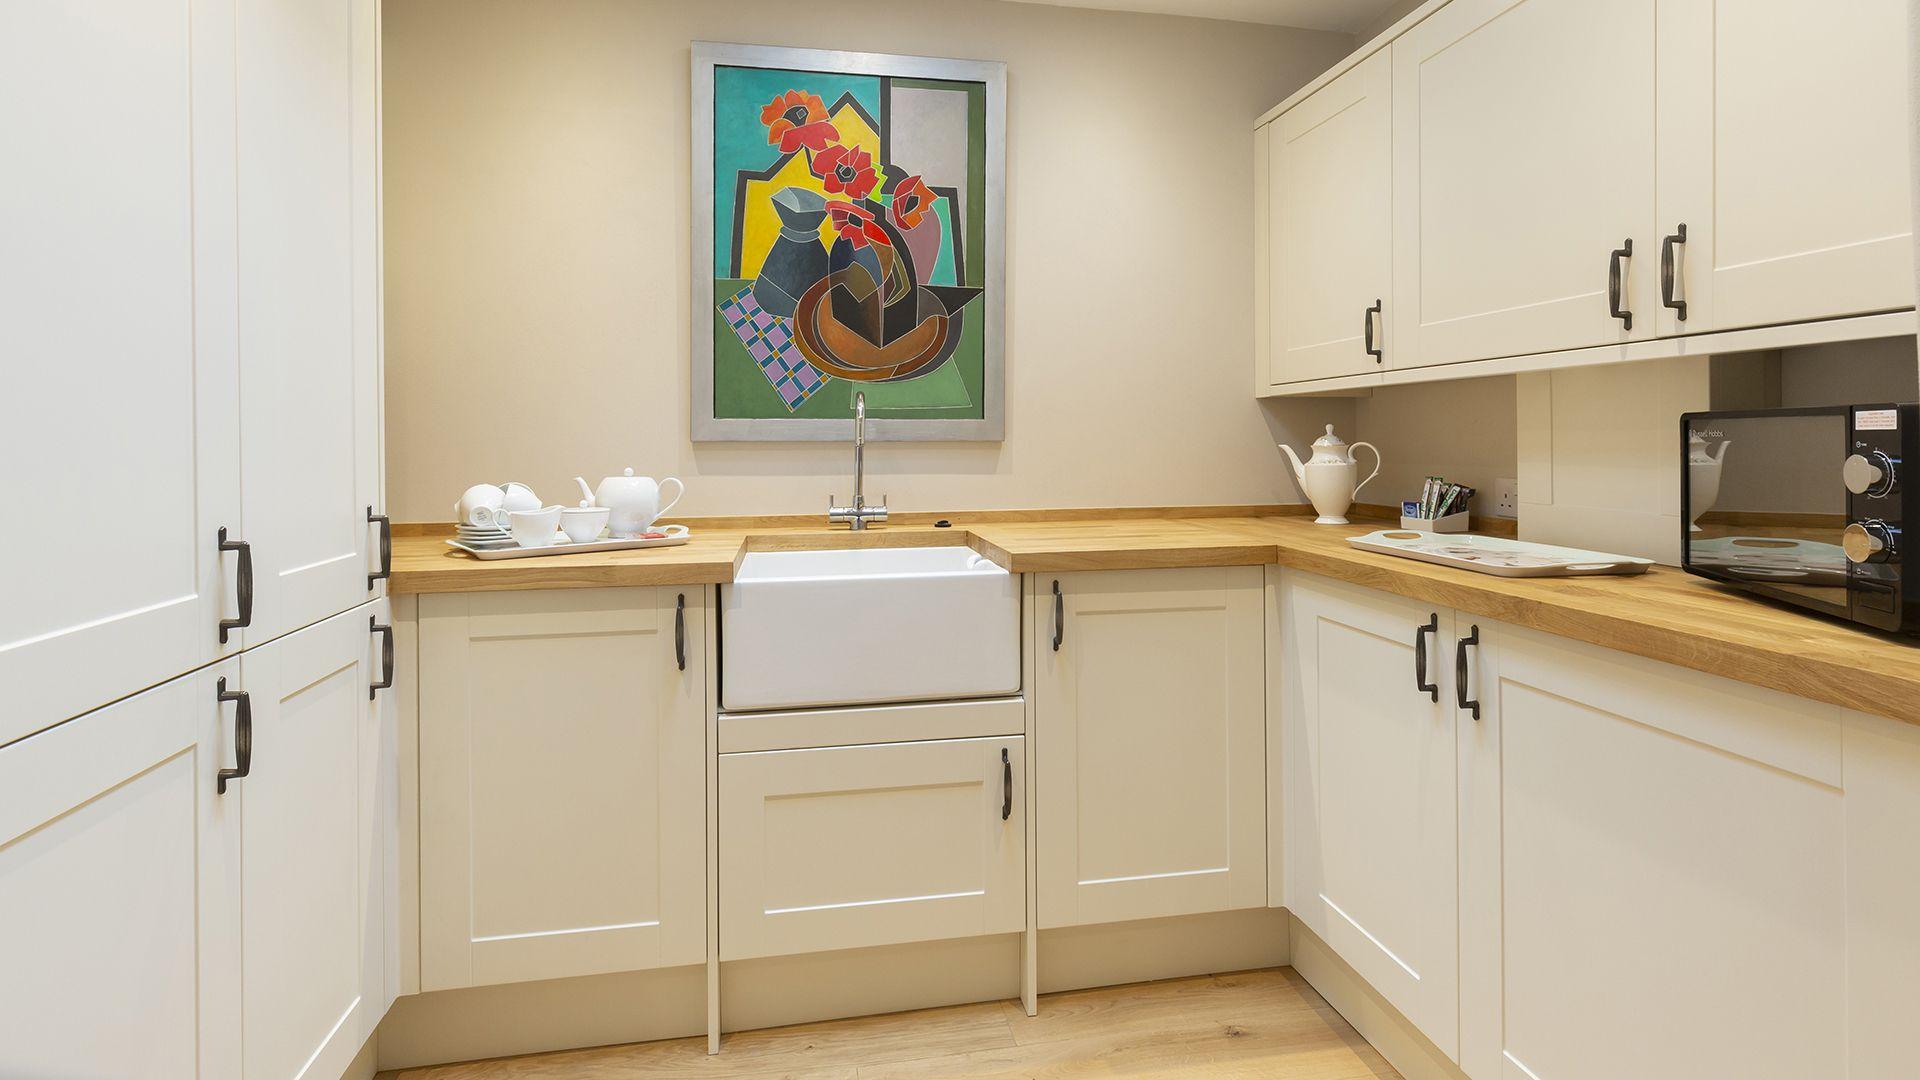 Kitchen with Belfast Sink, 14 Vineyard Street, Bolthole Retreats